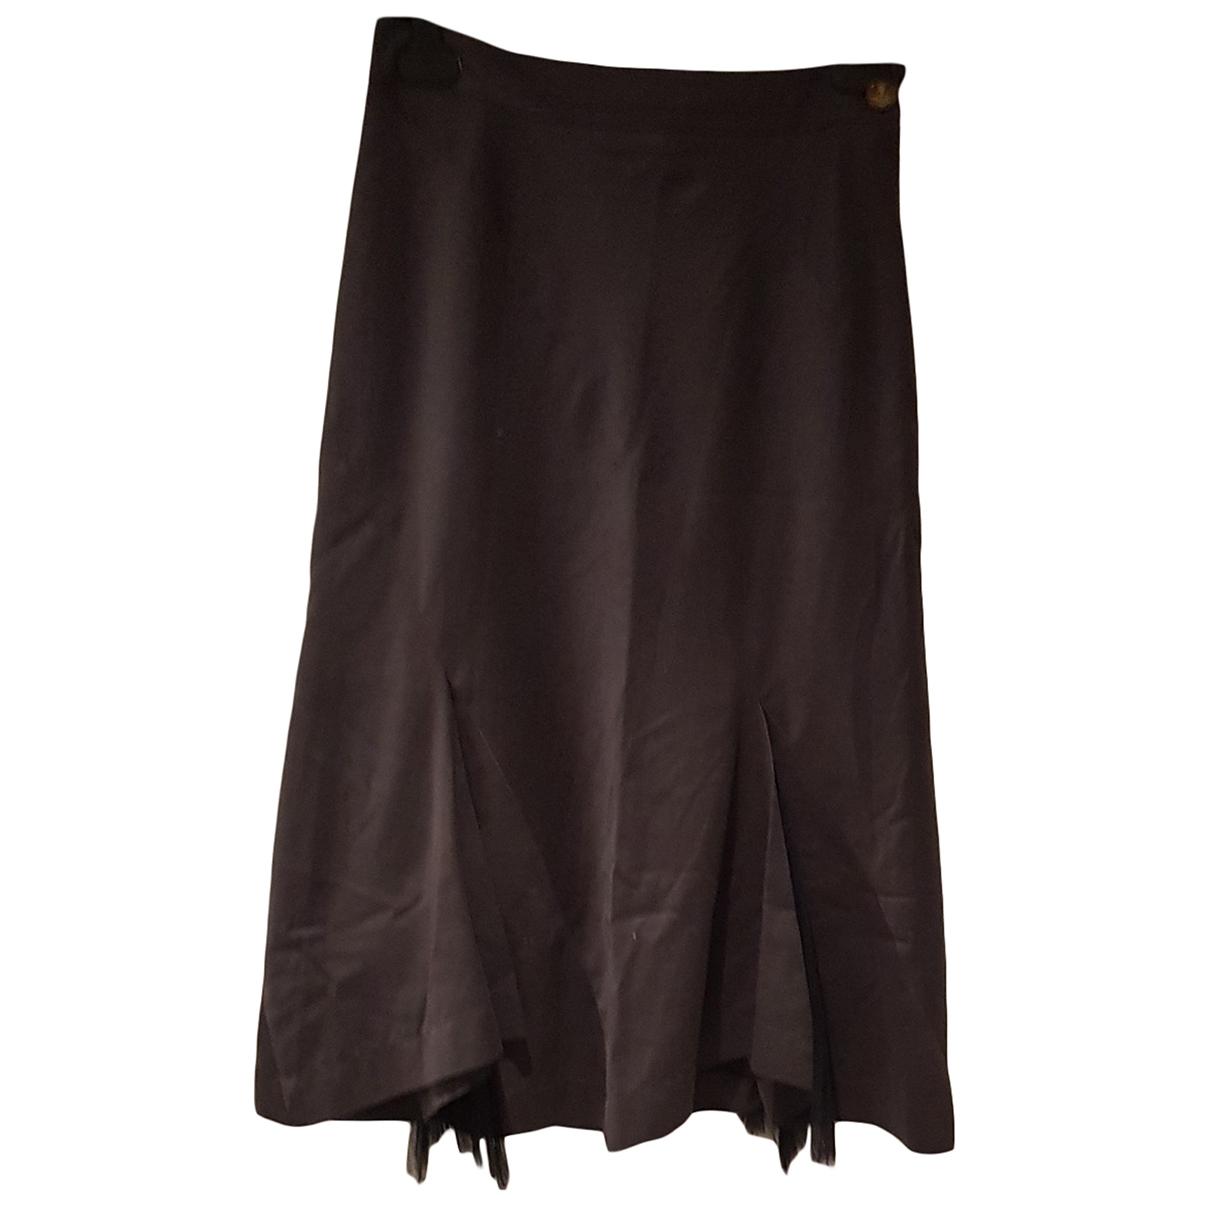 Vivienne Westwood \N Brown Cotton skirt for Women 40 FR